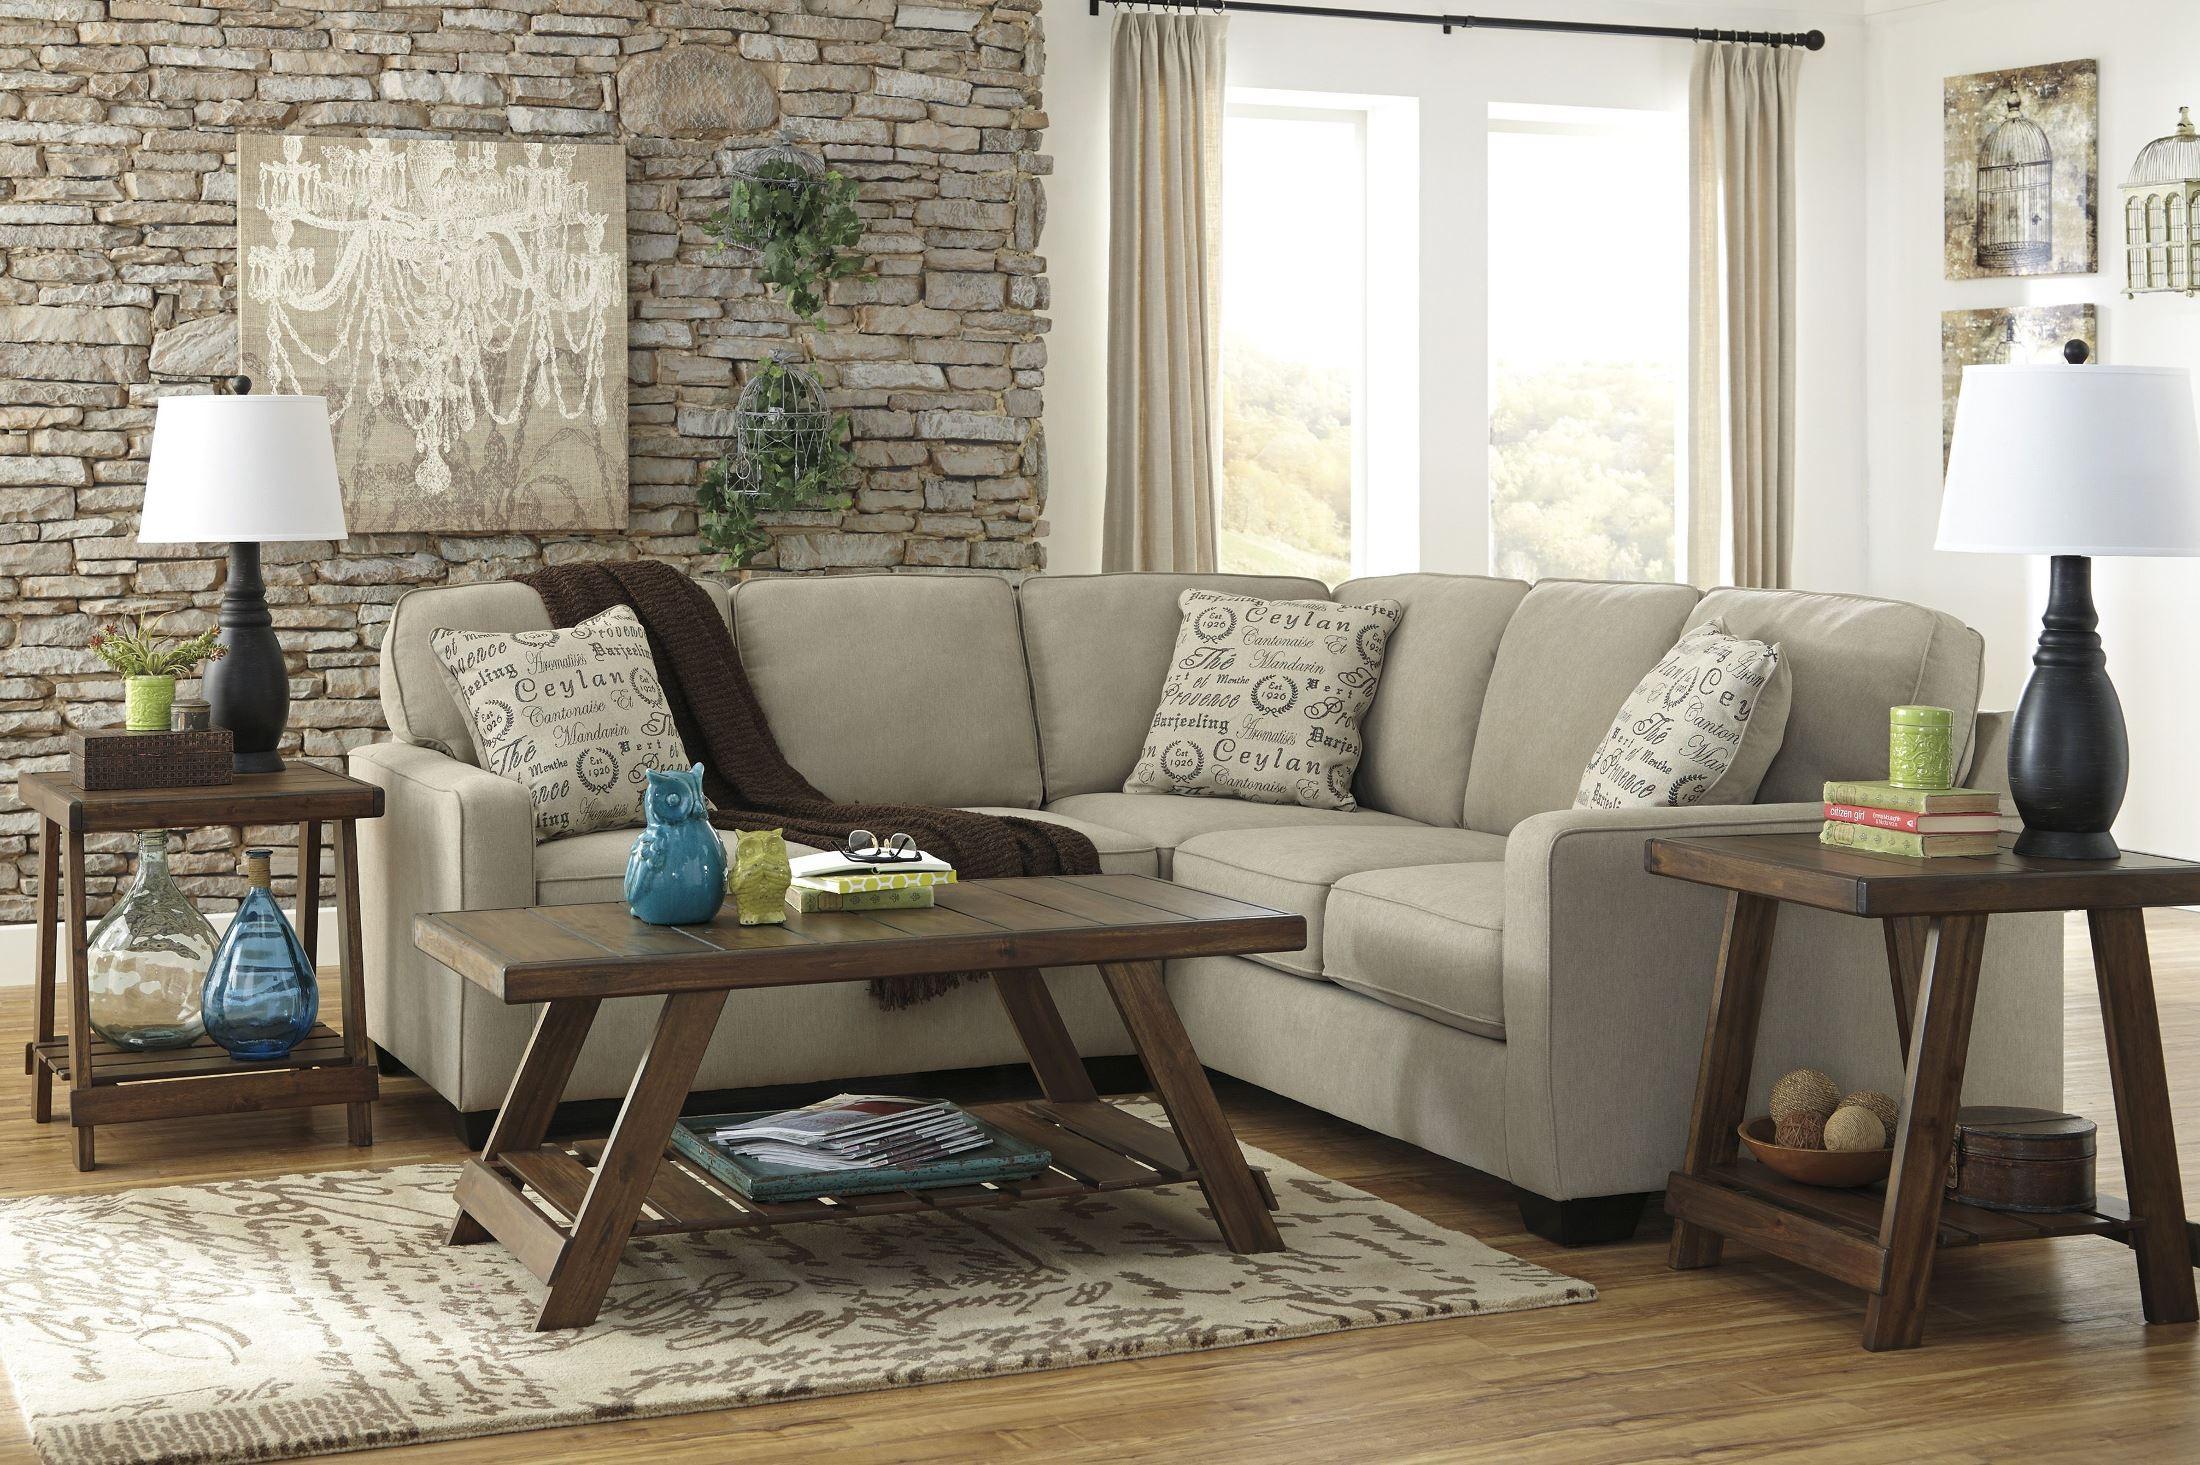 Alenya Quartz Laf Sectional From Ashley Coleman Furniture